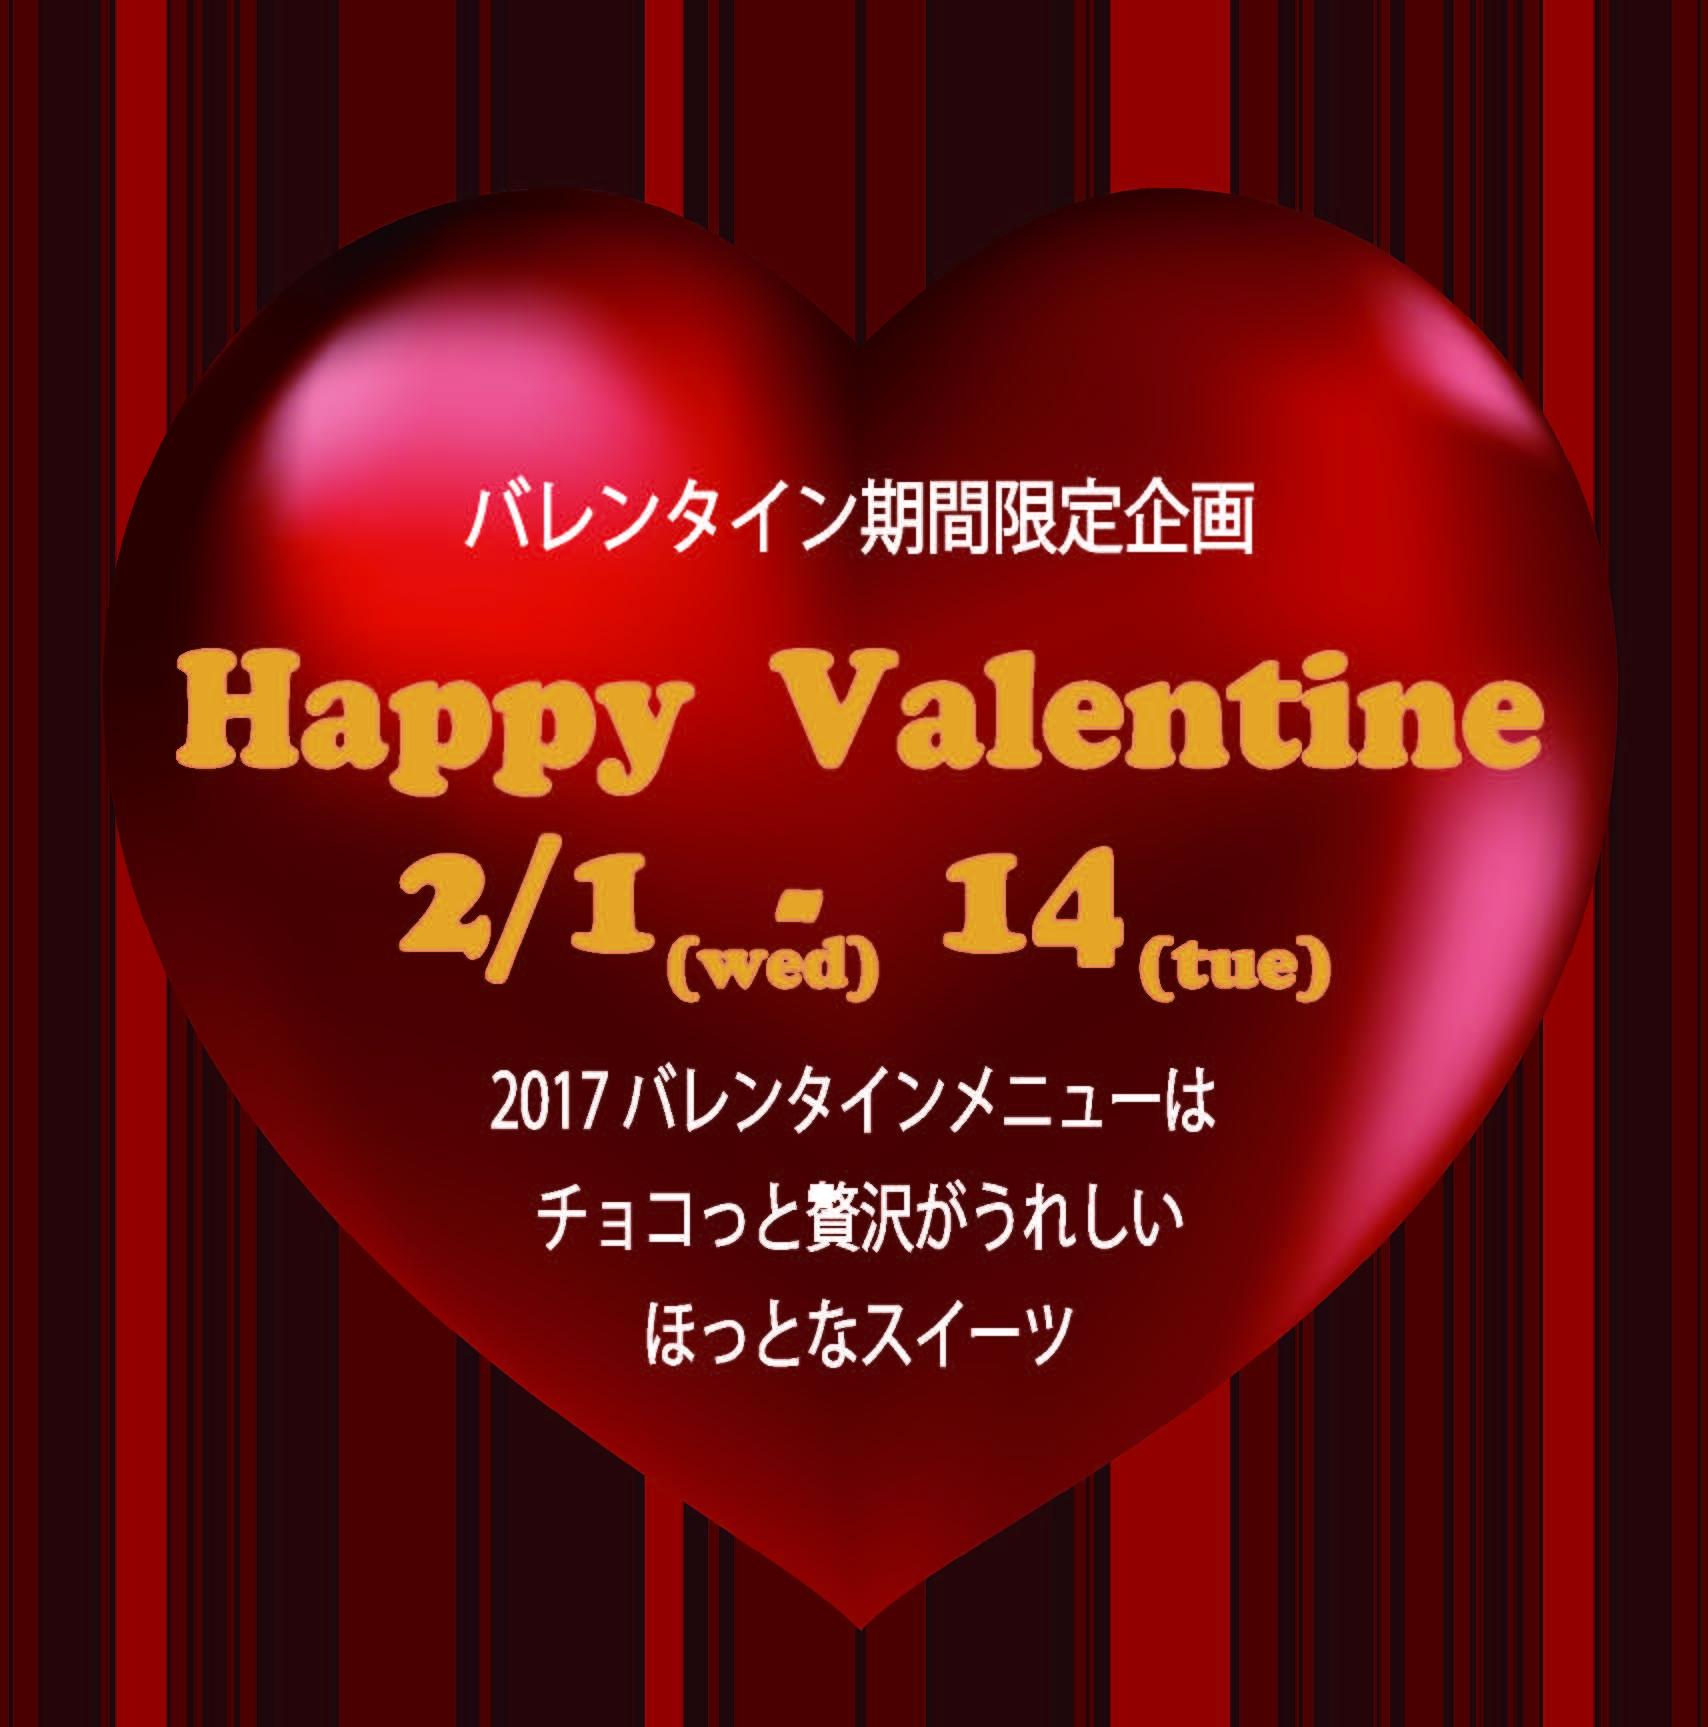 Valentine Sweet 2017